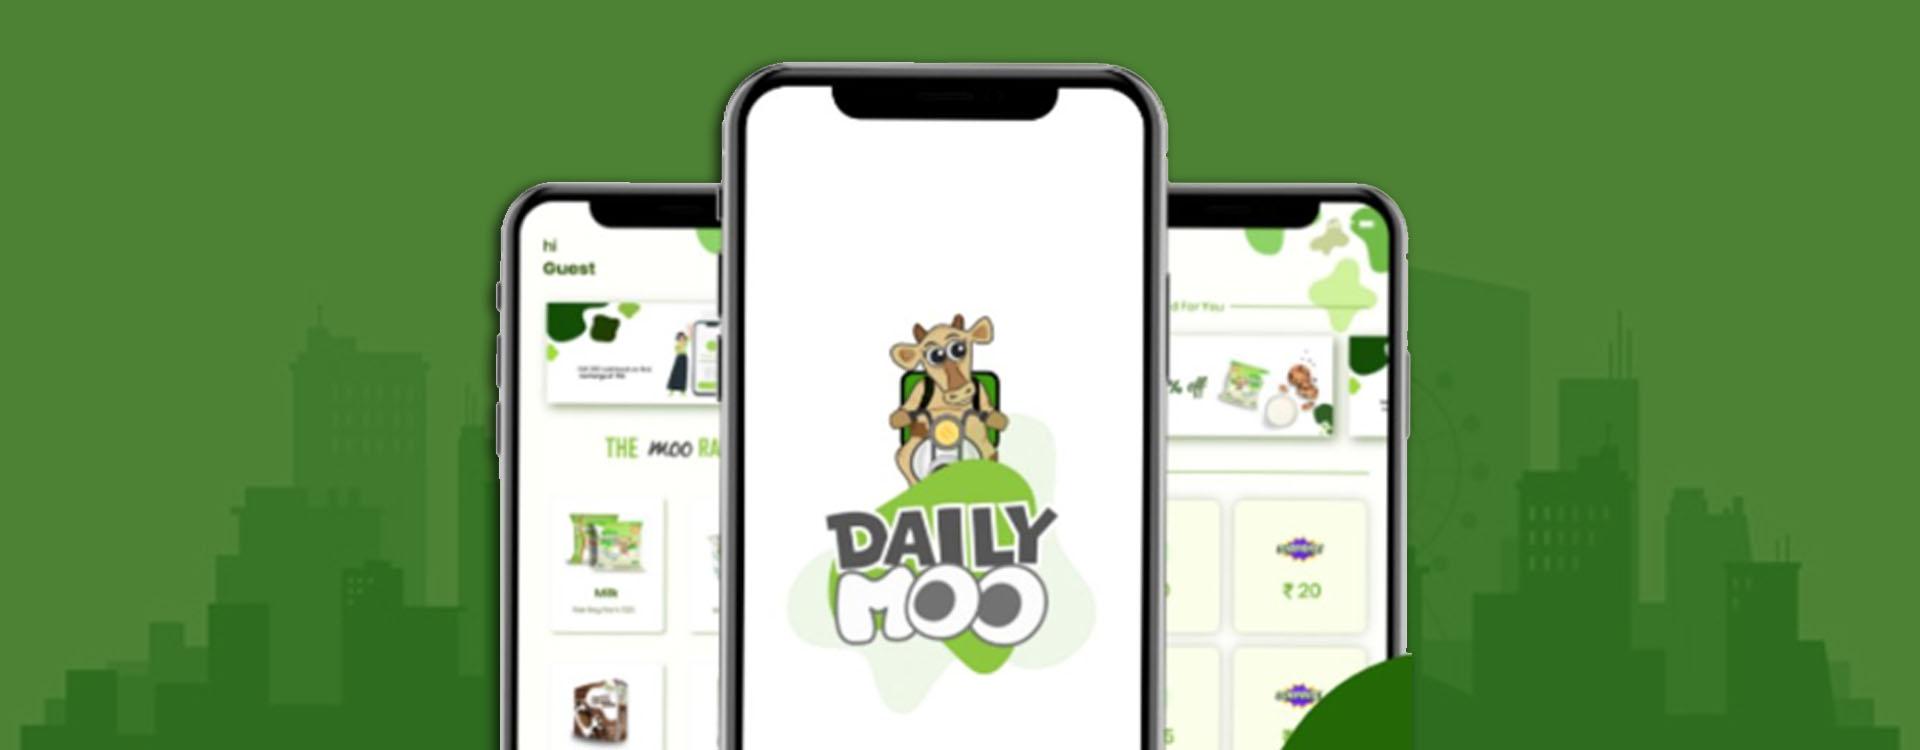 Milk Mantra app DailyMoo's growth